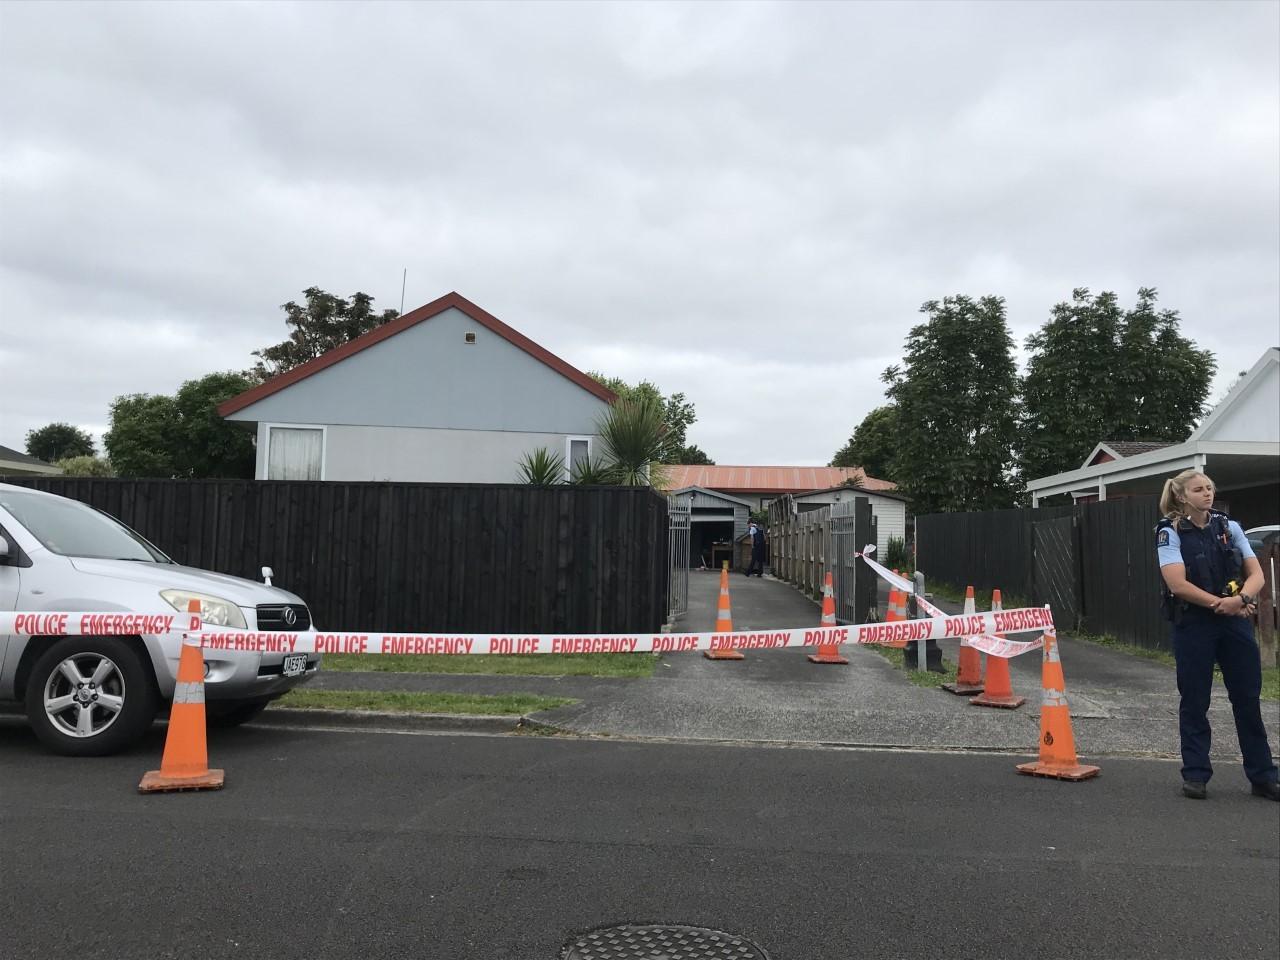 Australian Based Whanau Of Hamilton Murder Victim To Miss Funeral Nz Herald